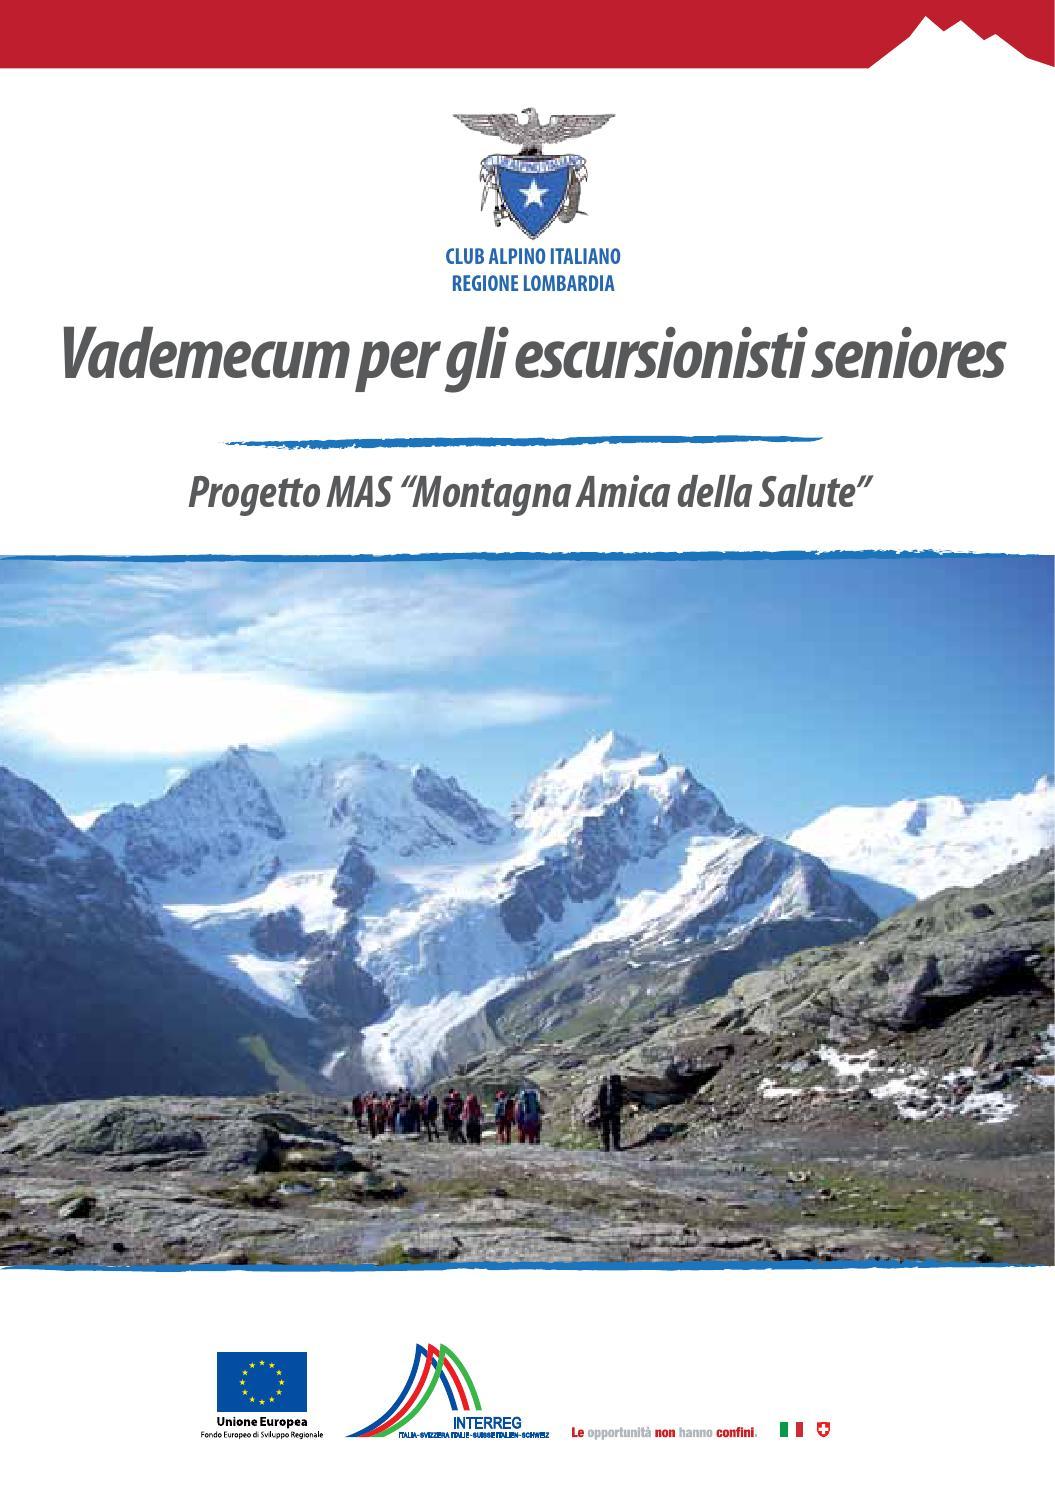 Vademecum Per Gli Escursionisti Seniores By Cai Regione Lombardia Issuu